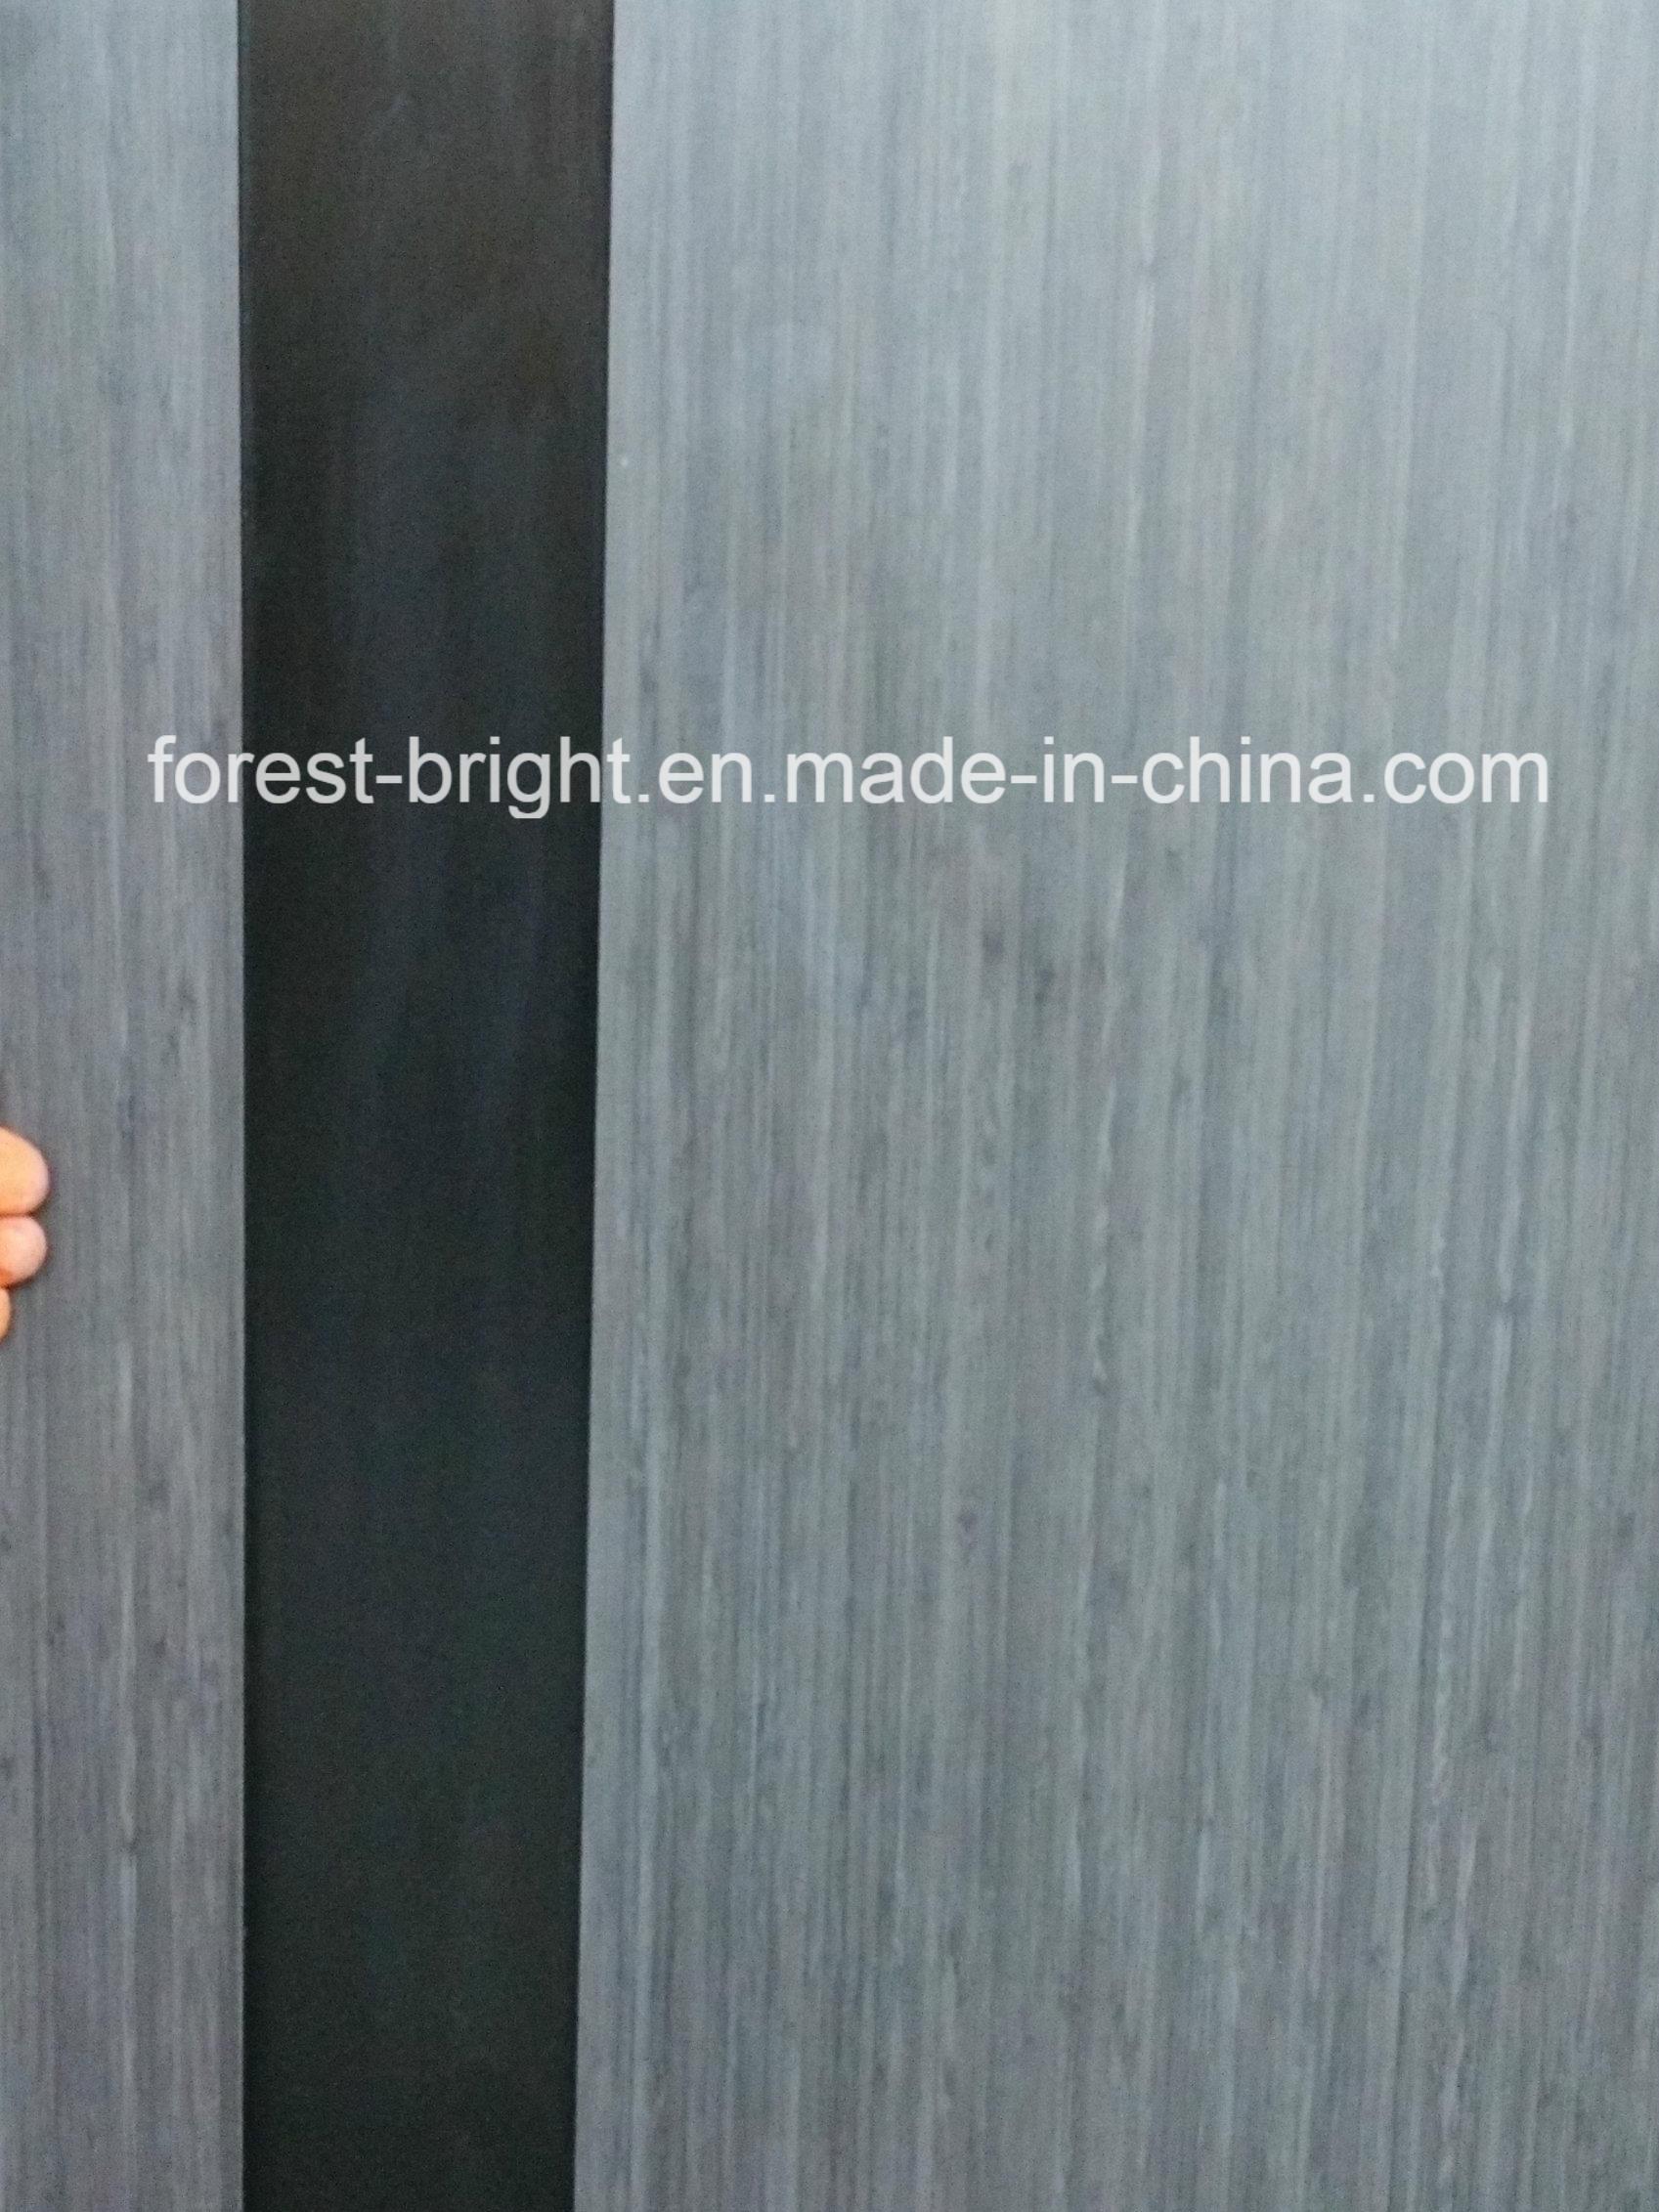 Marriott Hotel Hpdl Laminated Commercial Guestroom Entry Doors